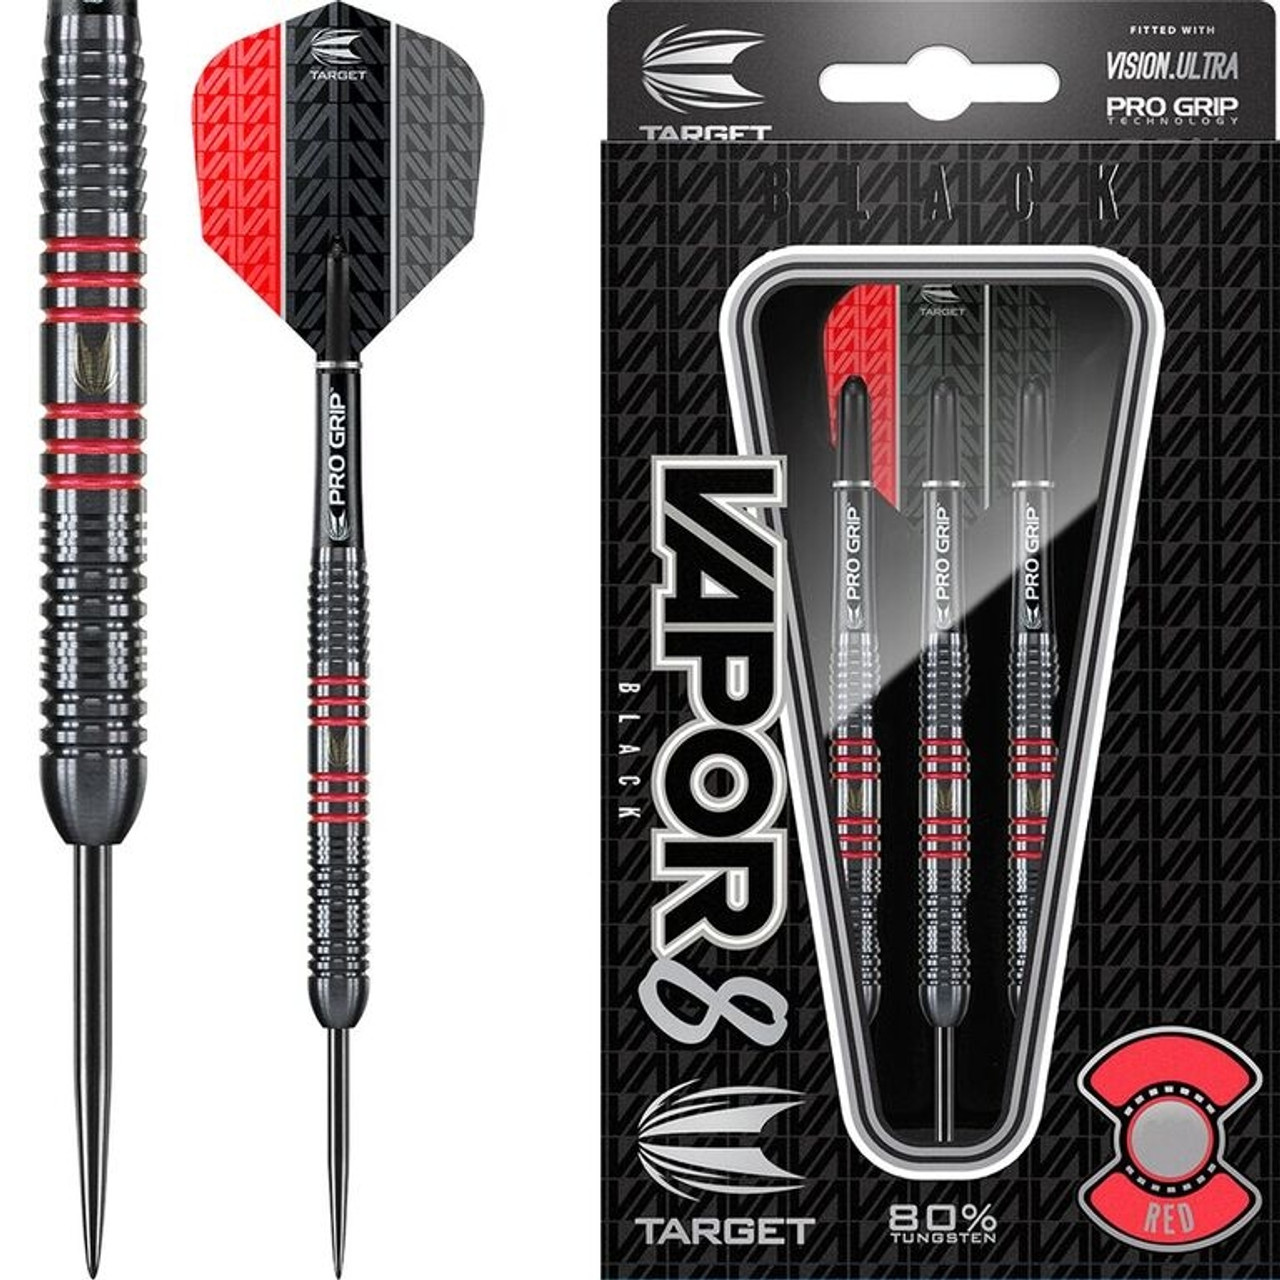 0715b2e8ba709 Target Vapor-8 Black Red Steel Tip Darts - 25g - 80% Tungsten